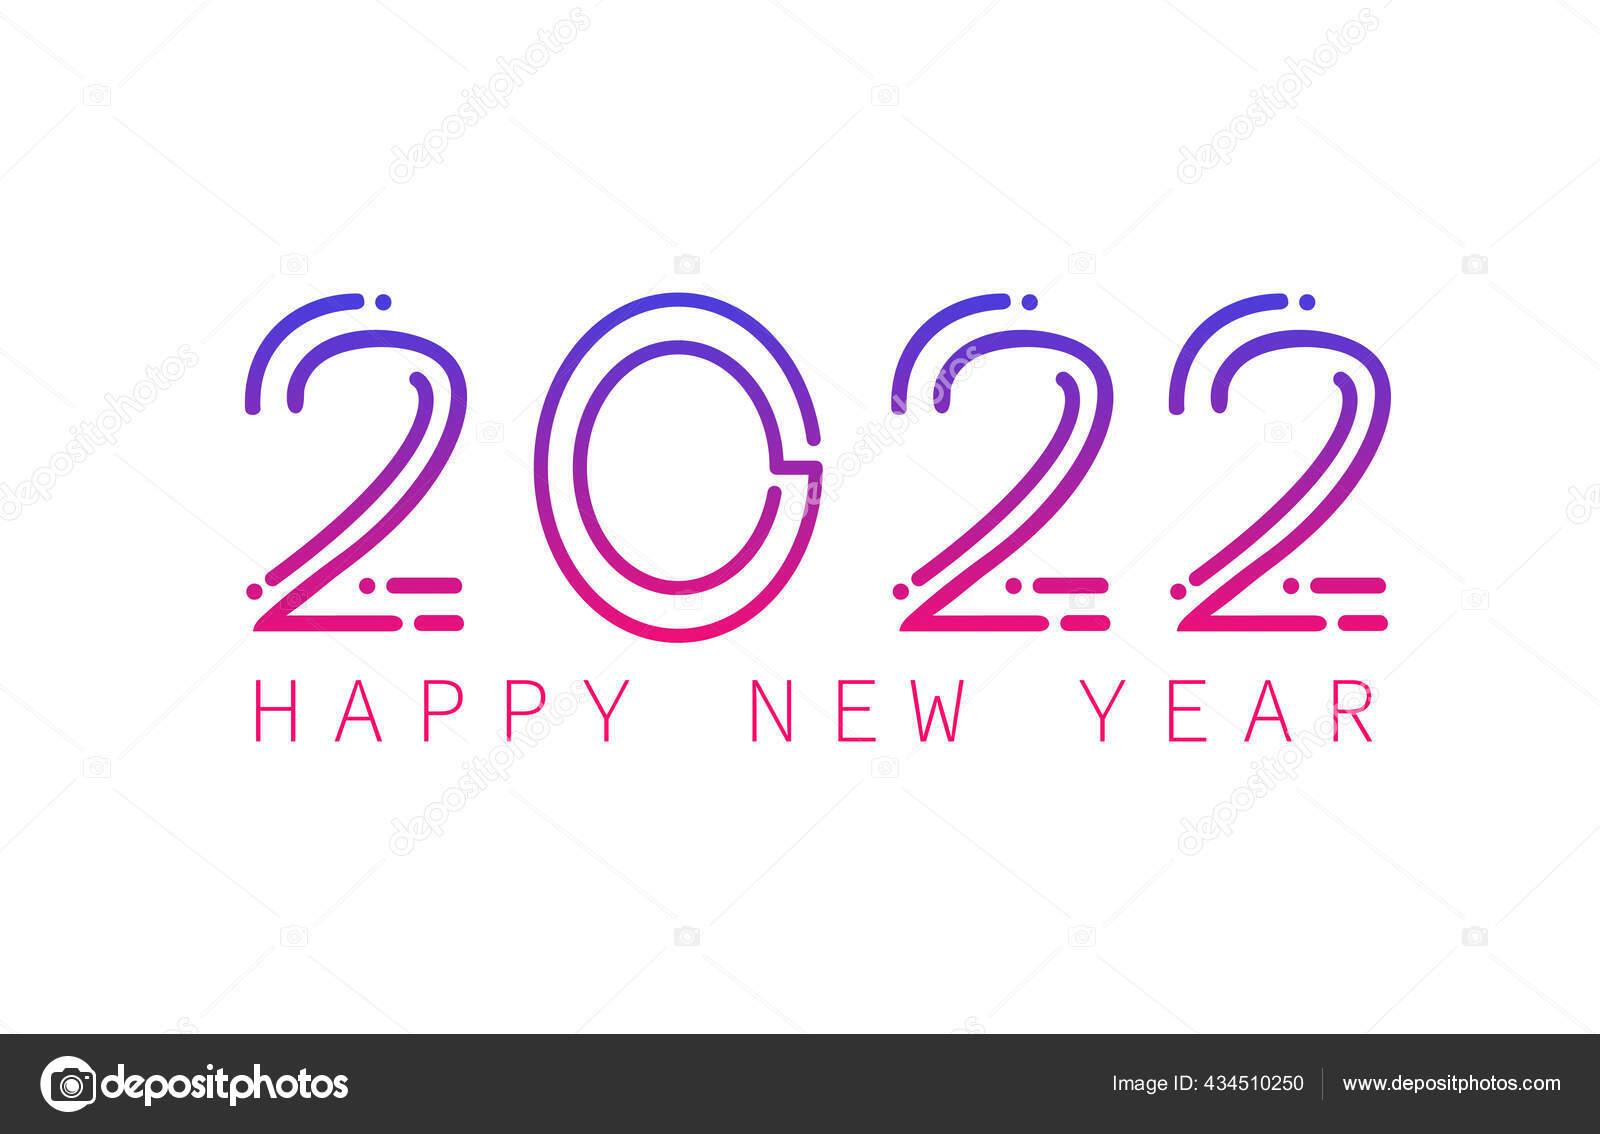 2022 Calendar Cover.Happy New Year 2022 Banner Design 2022 Brochure Calendar Cover Vector Image By C Rubelhossain Vector Stock 434510250